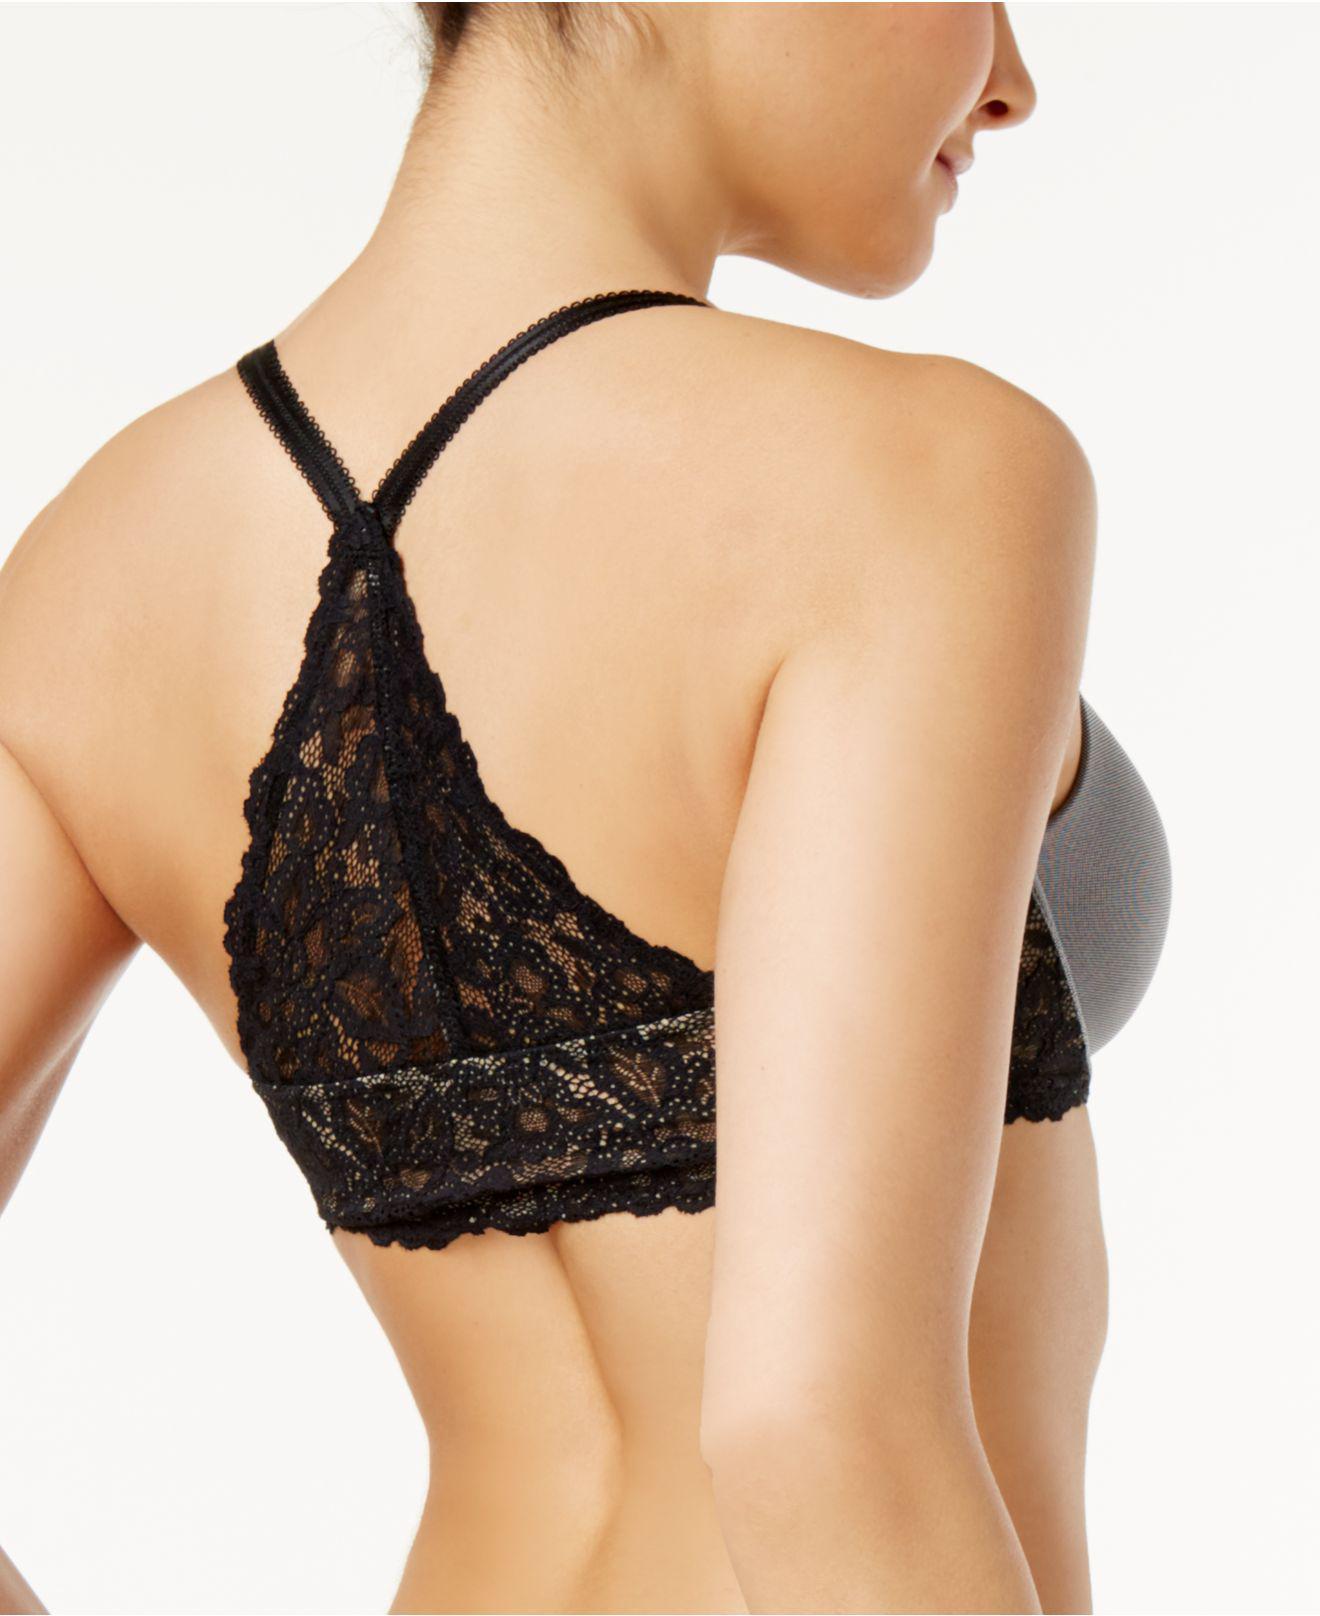 1555e0c6599fe Lyst - B.tempt d Charming Lace Bra 953332 in Black